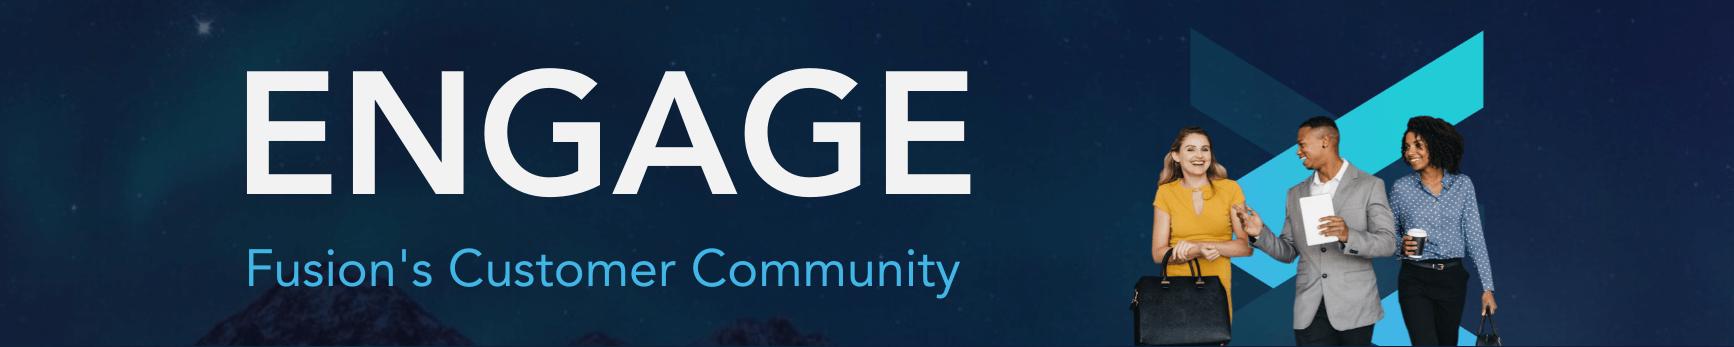 ENGAGE Fusion's Customer Community